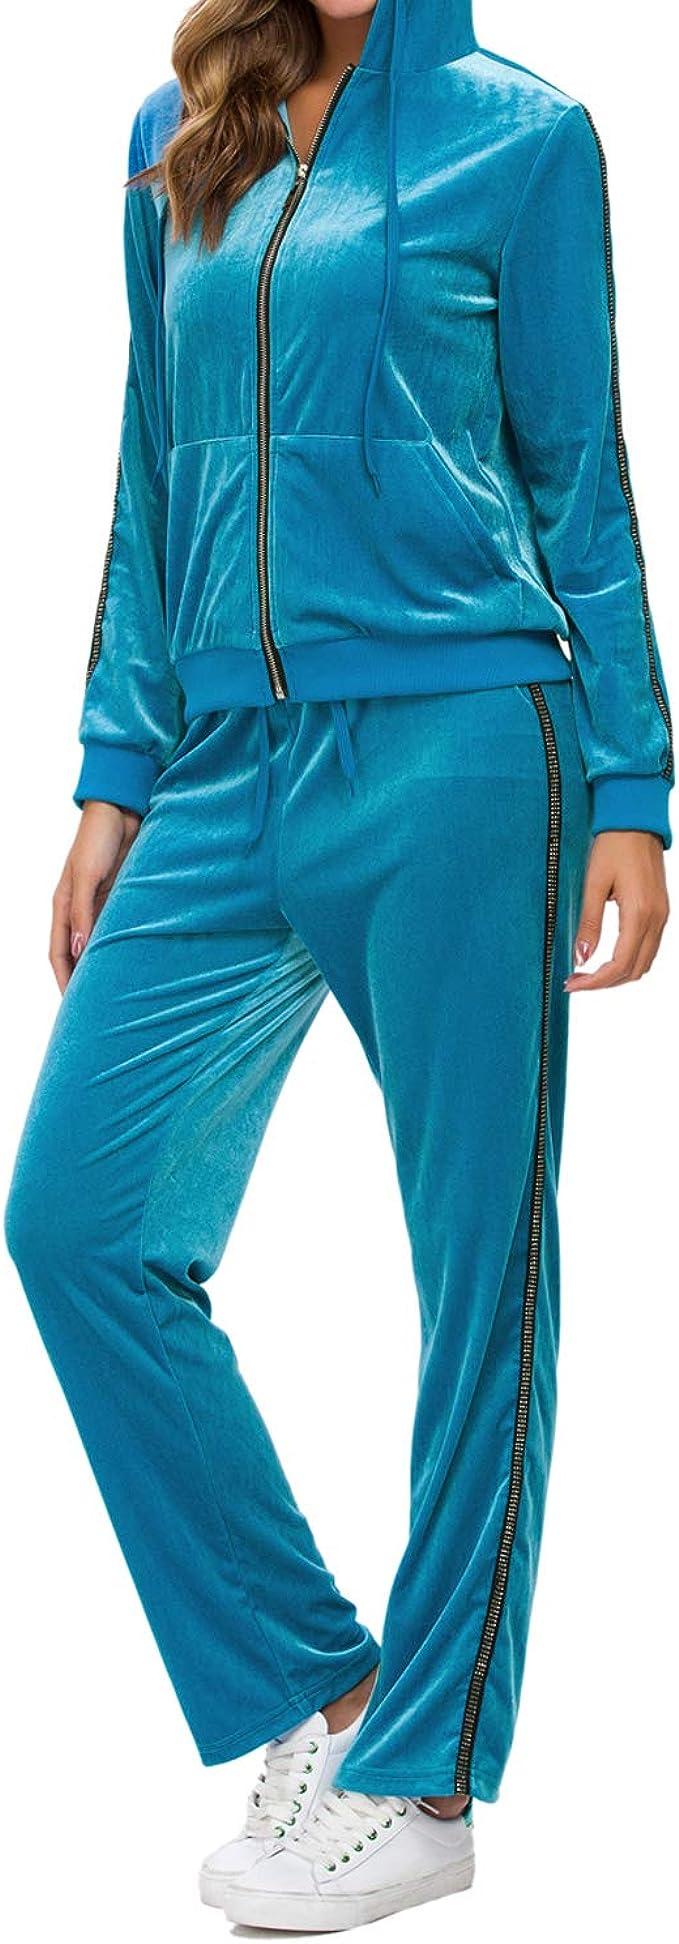 QCHENG Plus Sweatsuits for Women 2PC Striped Long Sleeve Pullover Sweatshirt Long Sweatpants Tracksuits Sweatsuits Set